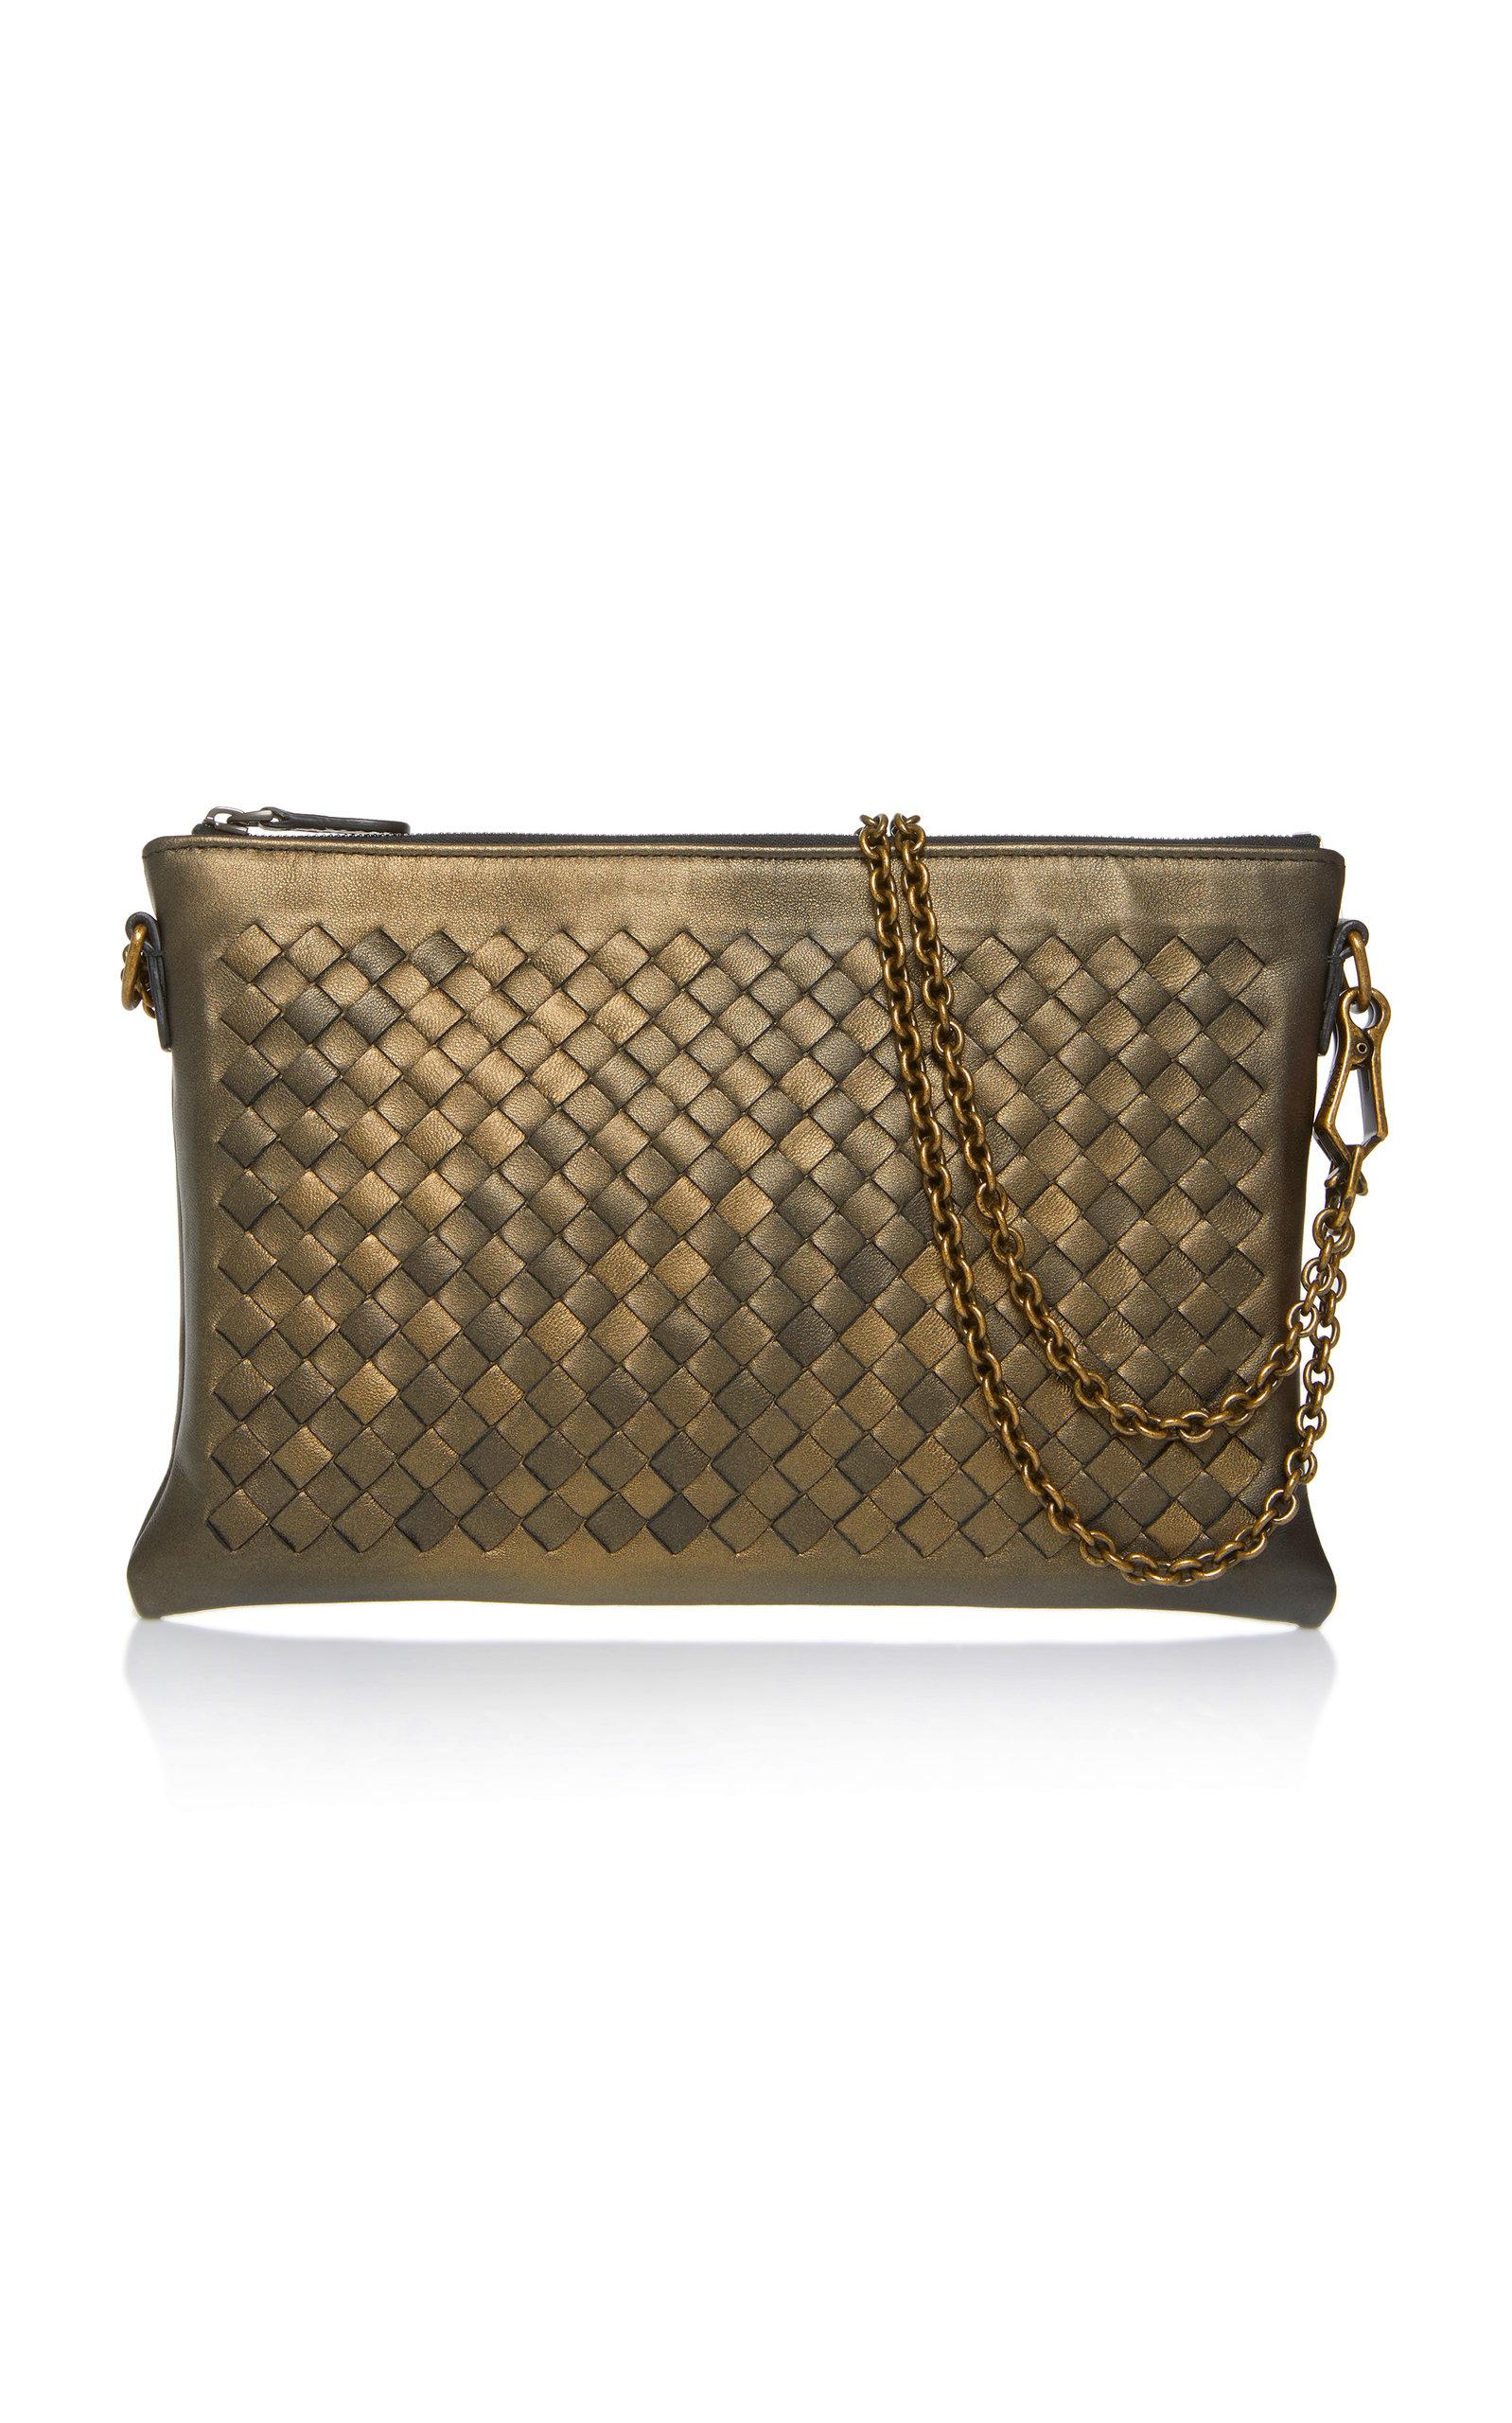 87138e7fac Bottega VenetaChain Strap Leather Wallet Bag. CLOSE. Loading